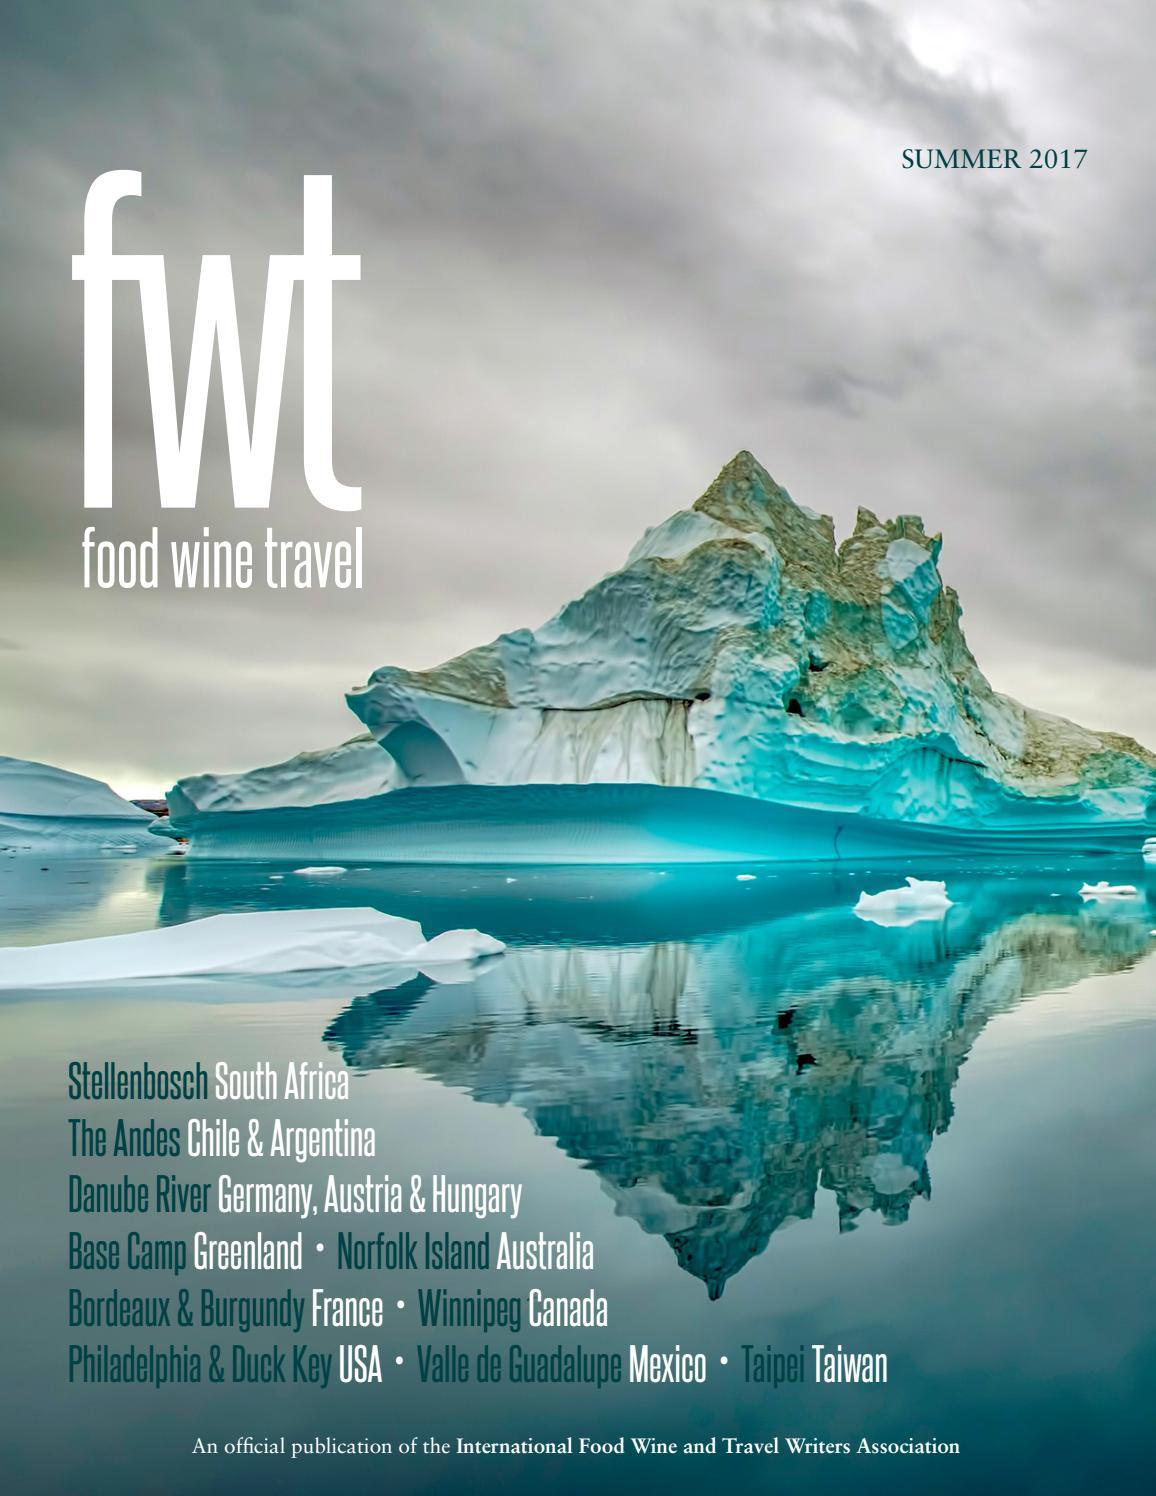 FWT Magazine: food wine travel - Summer 2017 by FWT Magazine - issuu